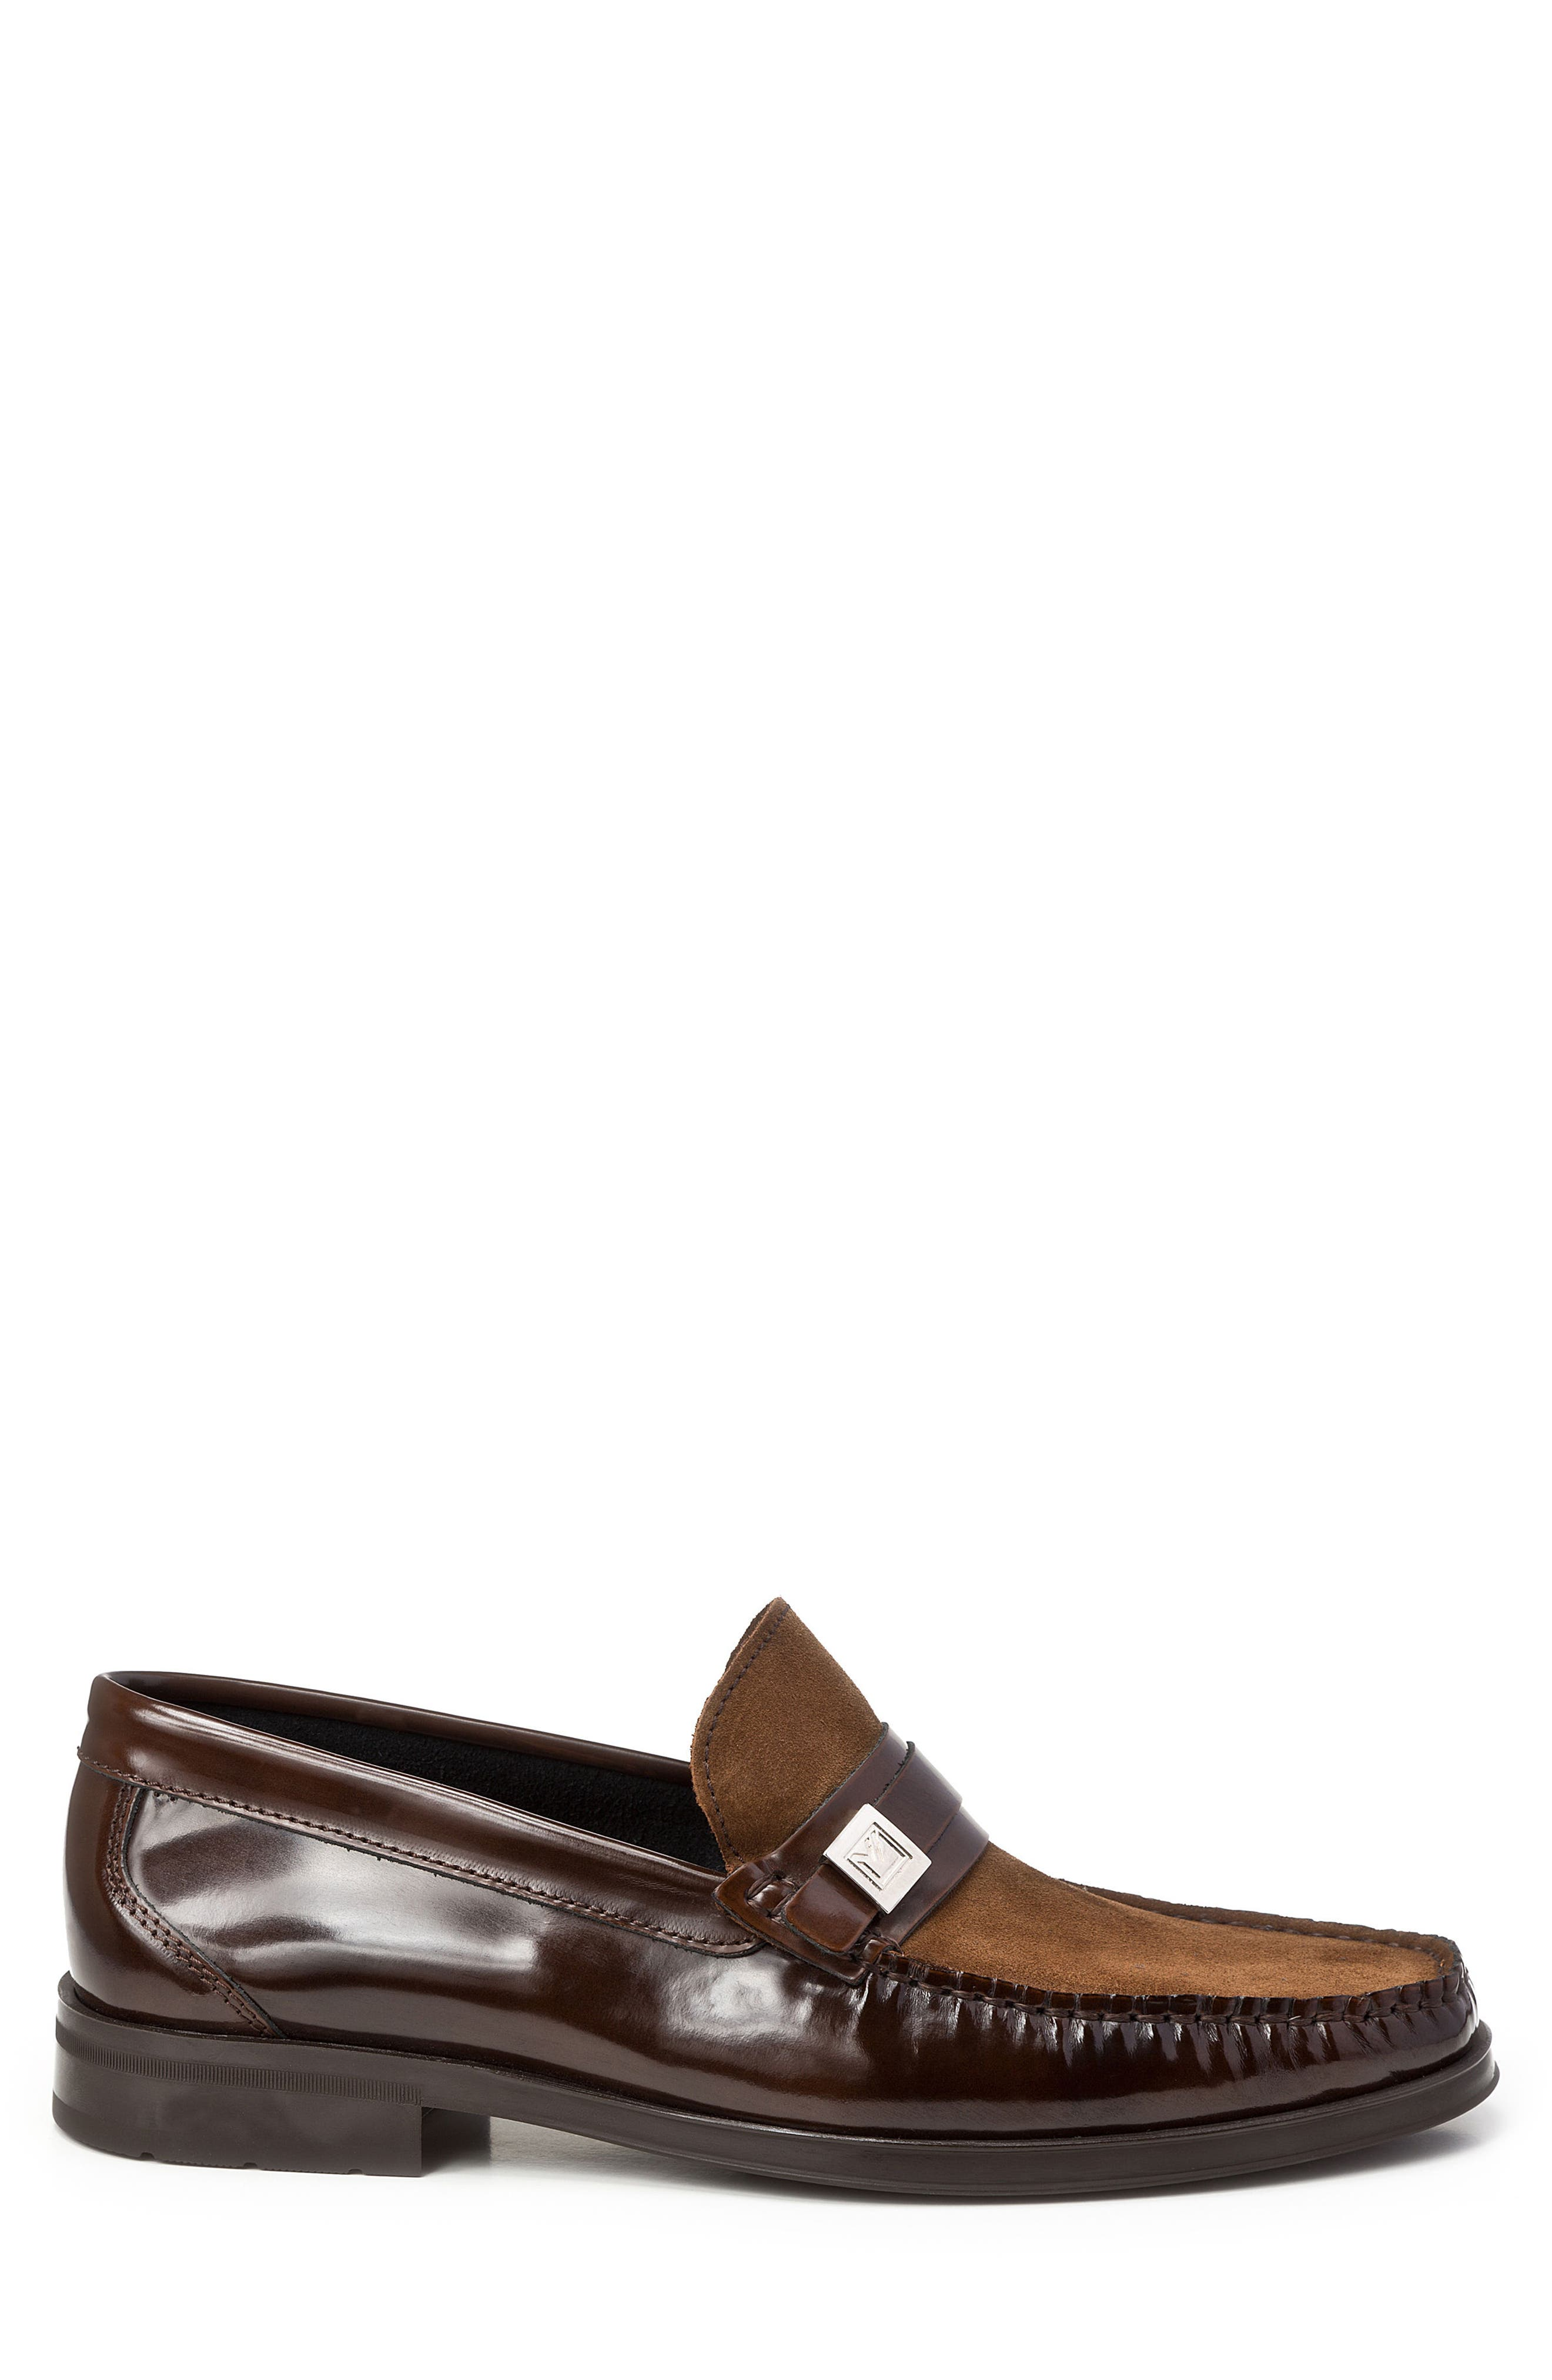 Avila Loafer,                             Alternate thumbnail 3, color,                             Brown Leather